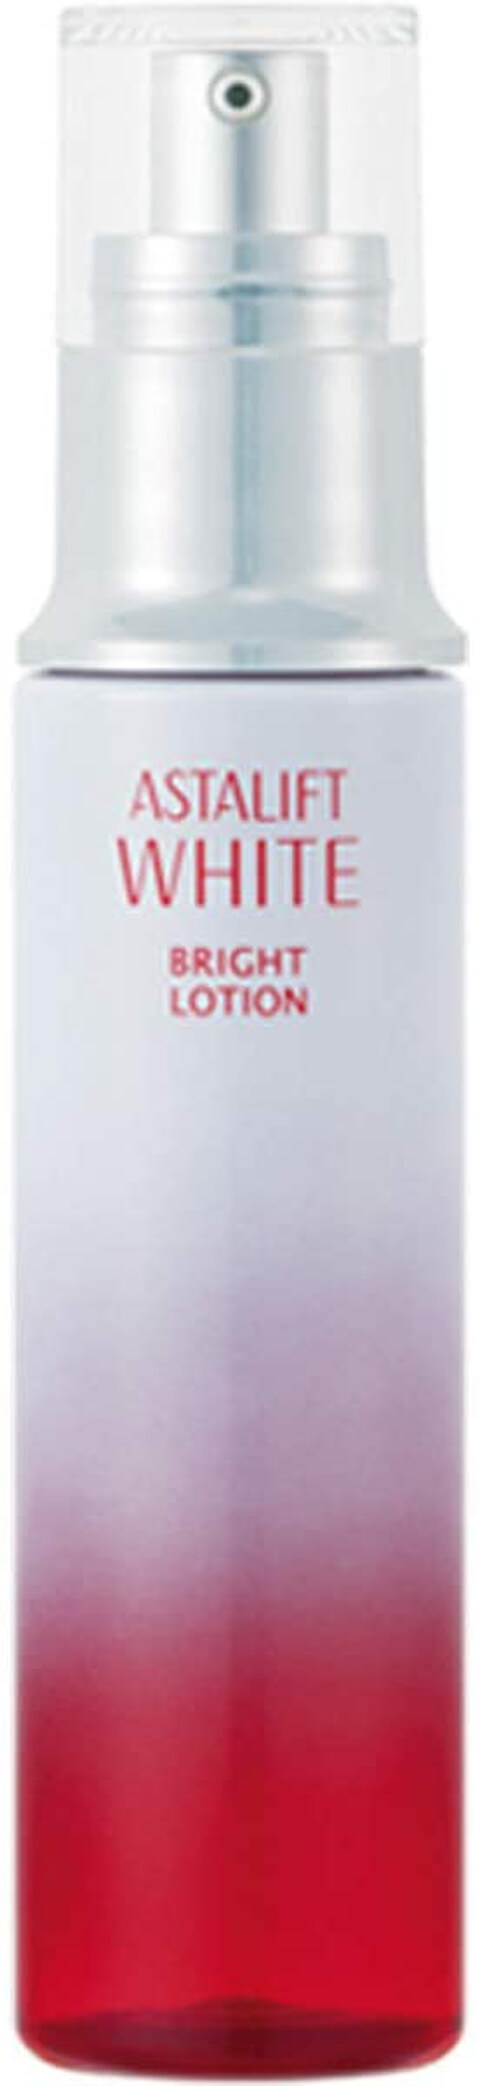 astalift-bright-lotion